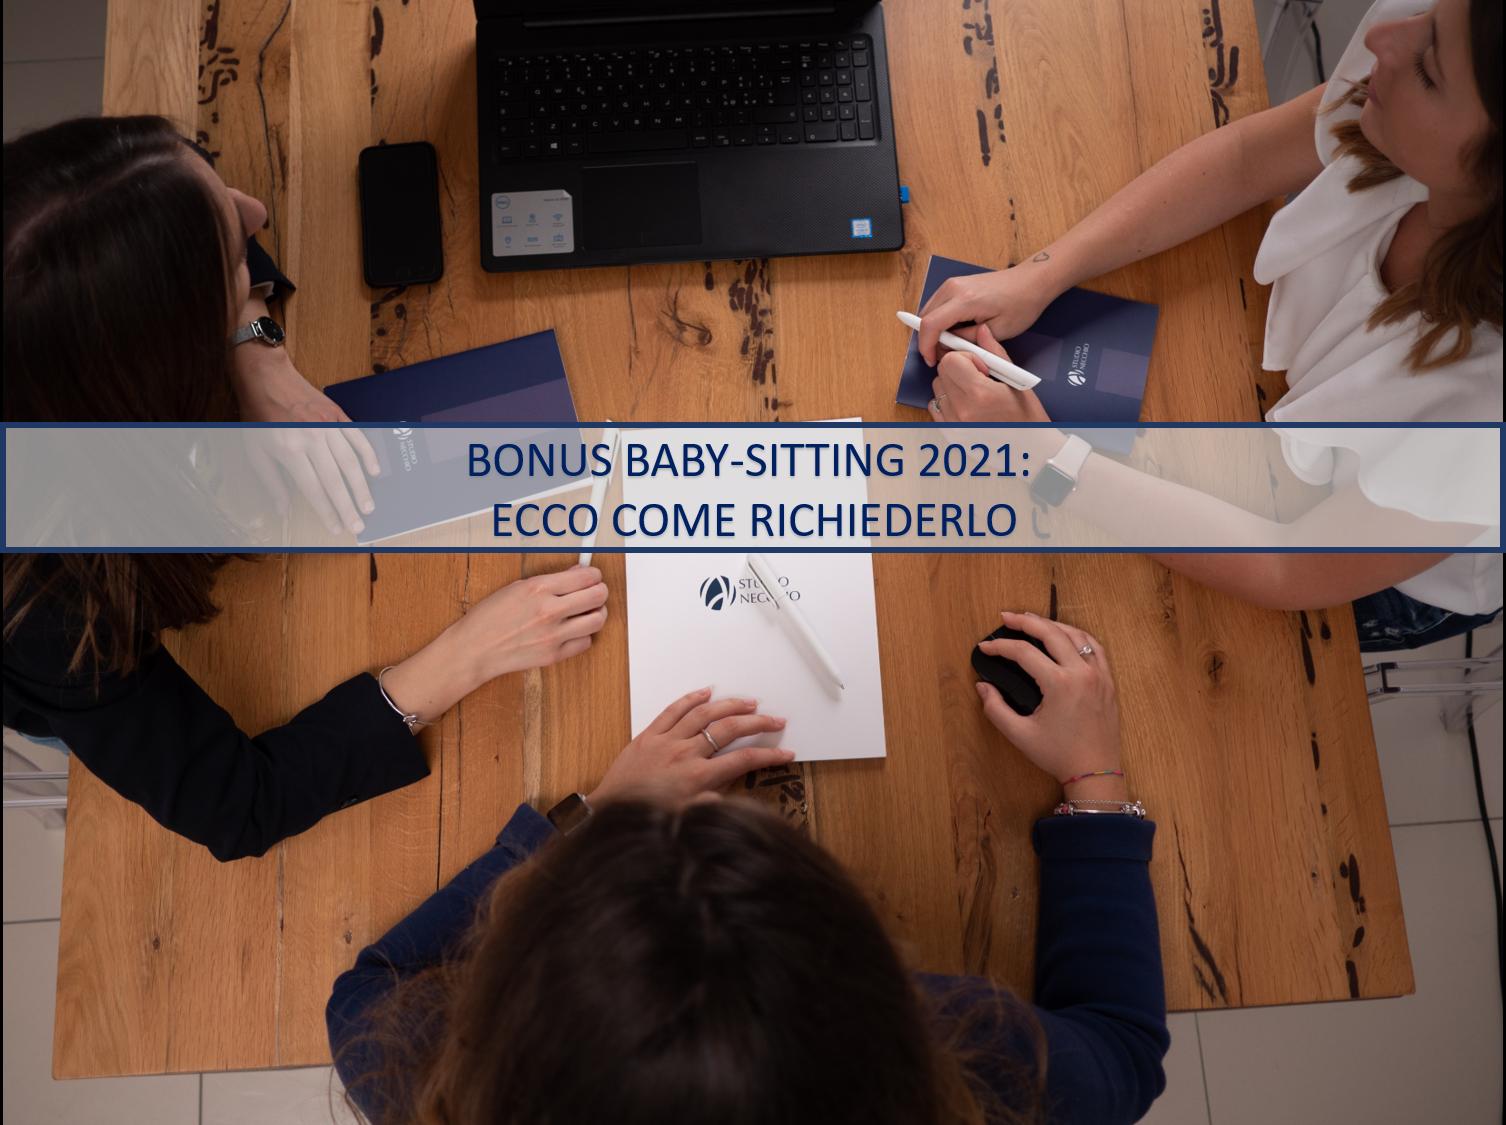 BONUS BABY-SITTING 2021: ECCO COME RICHIEDERLO